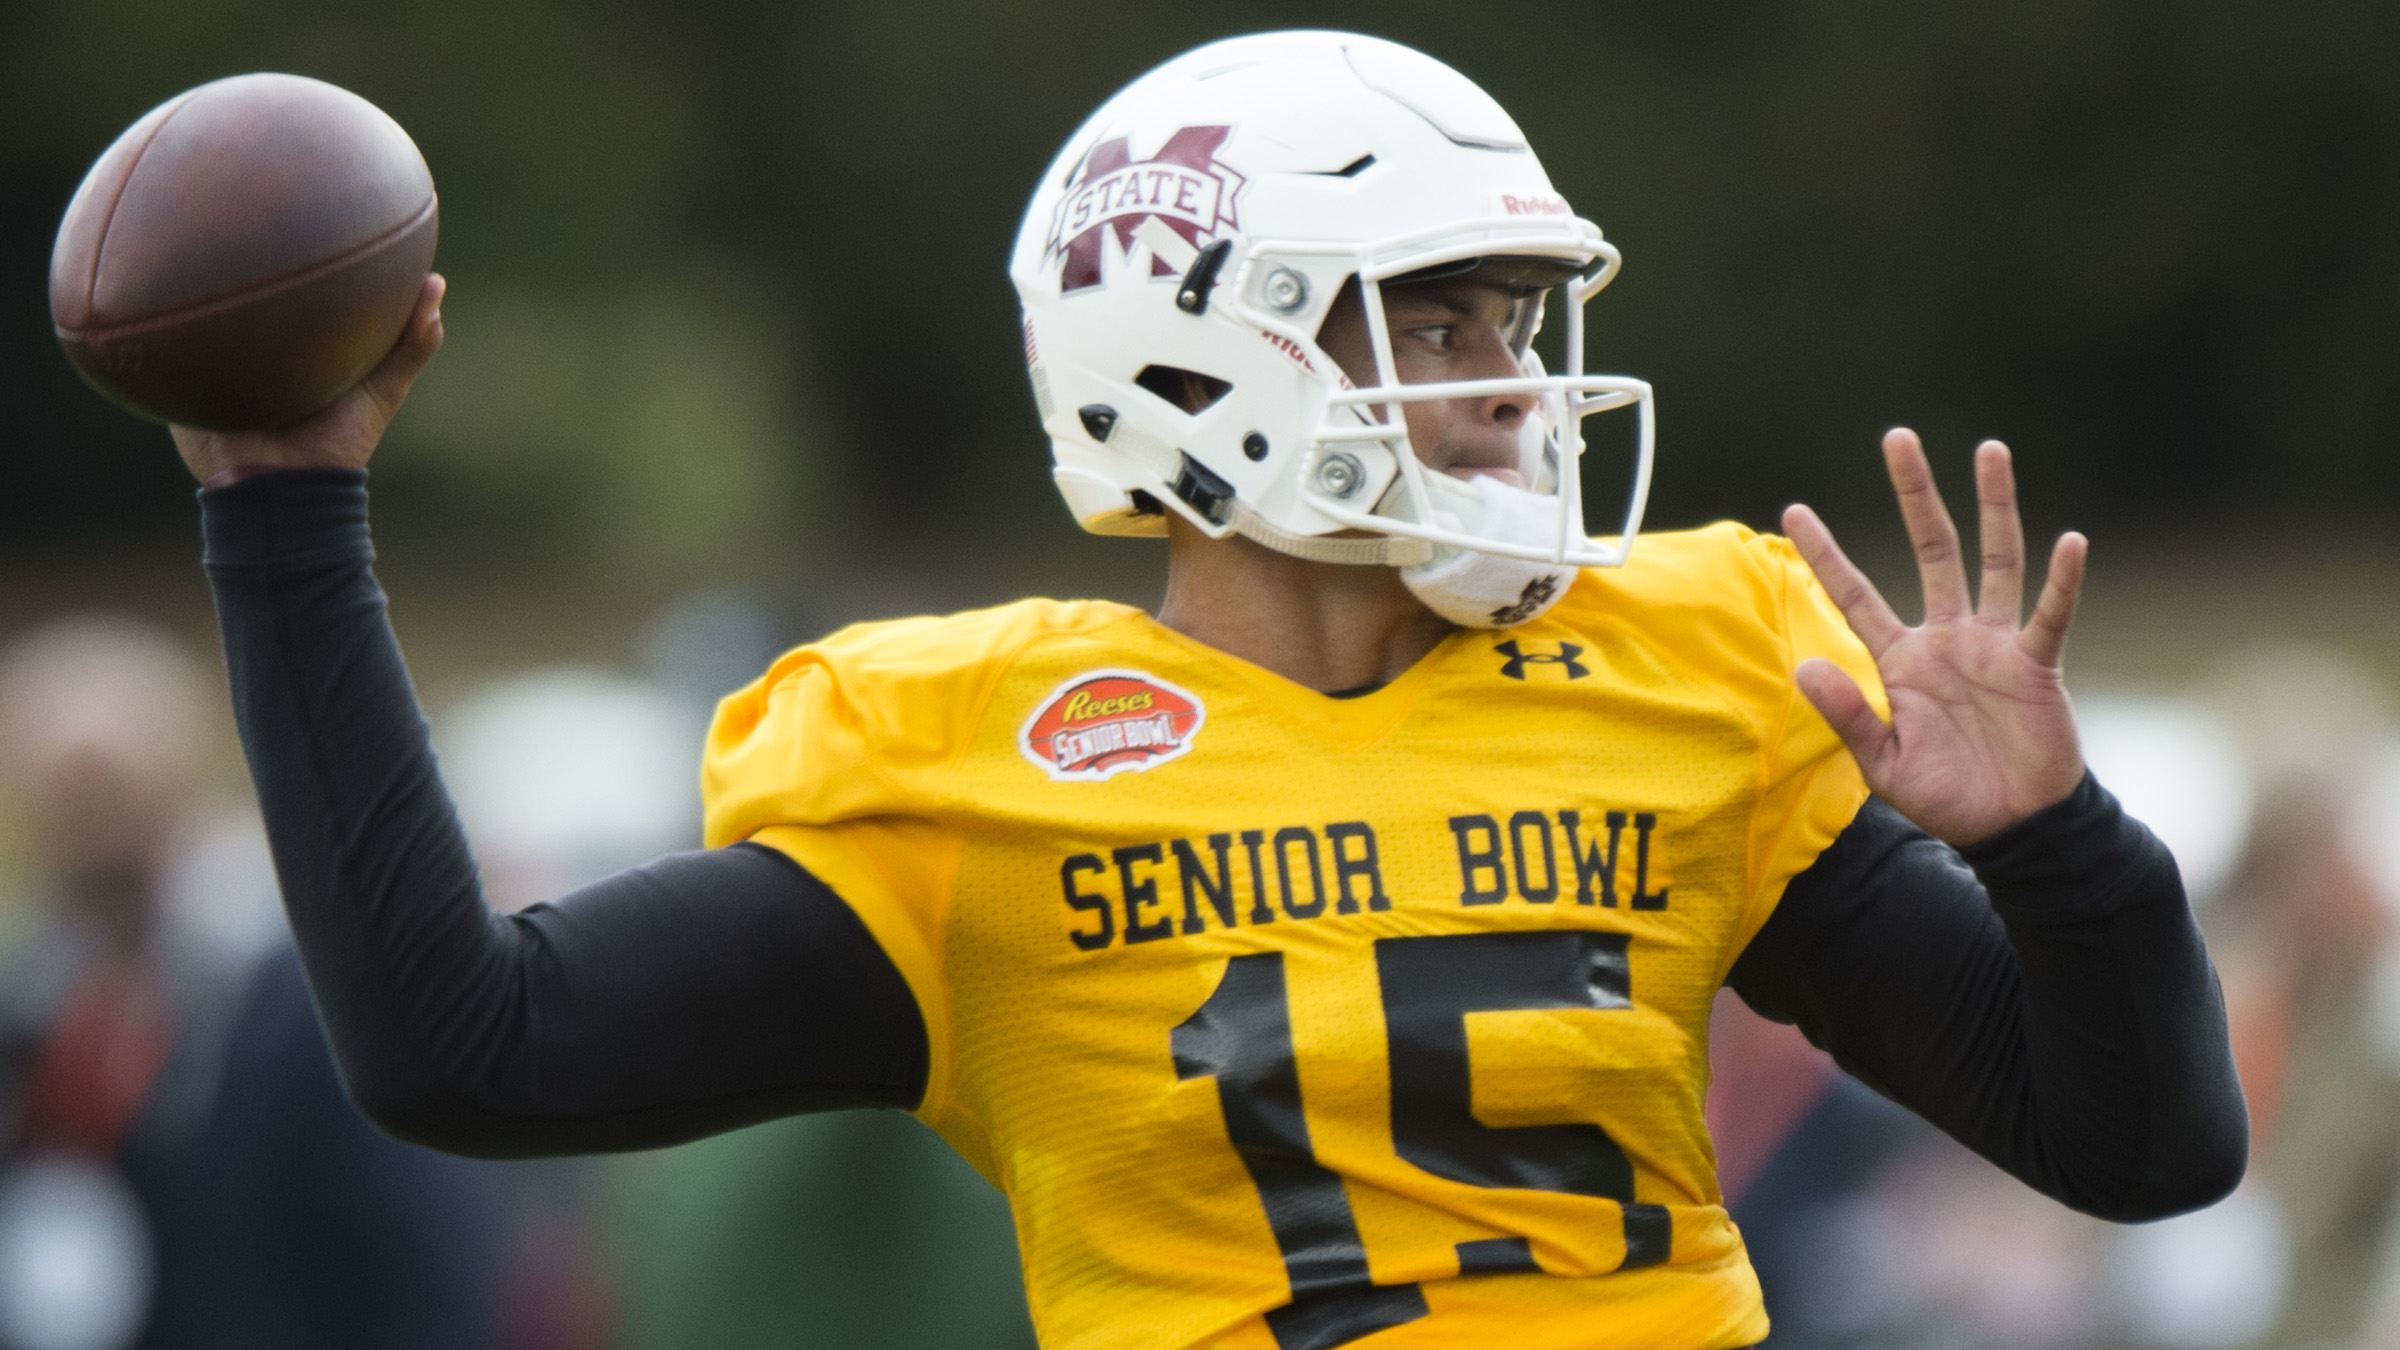 2017 Senior Bowl: Which Players Should Be On Cowboys' Radar?